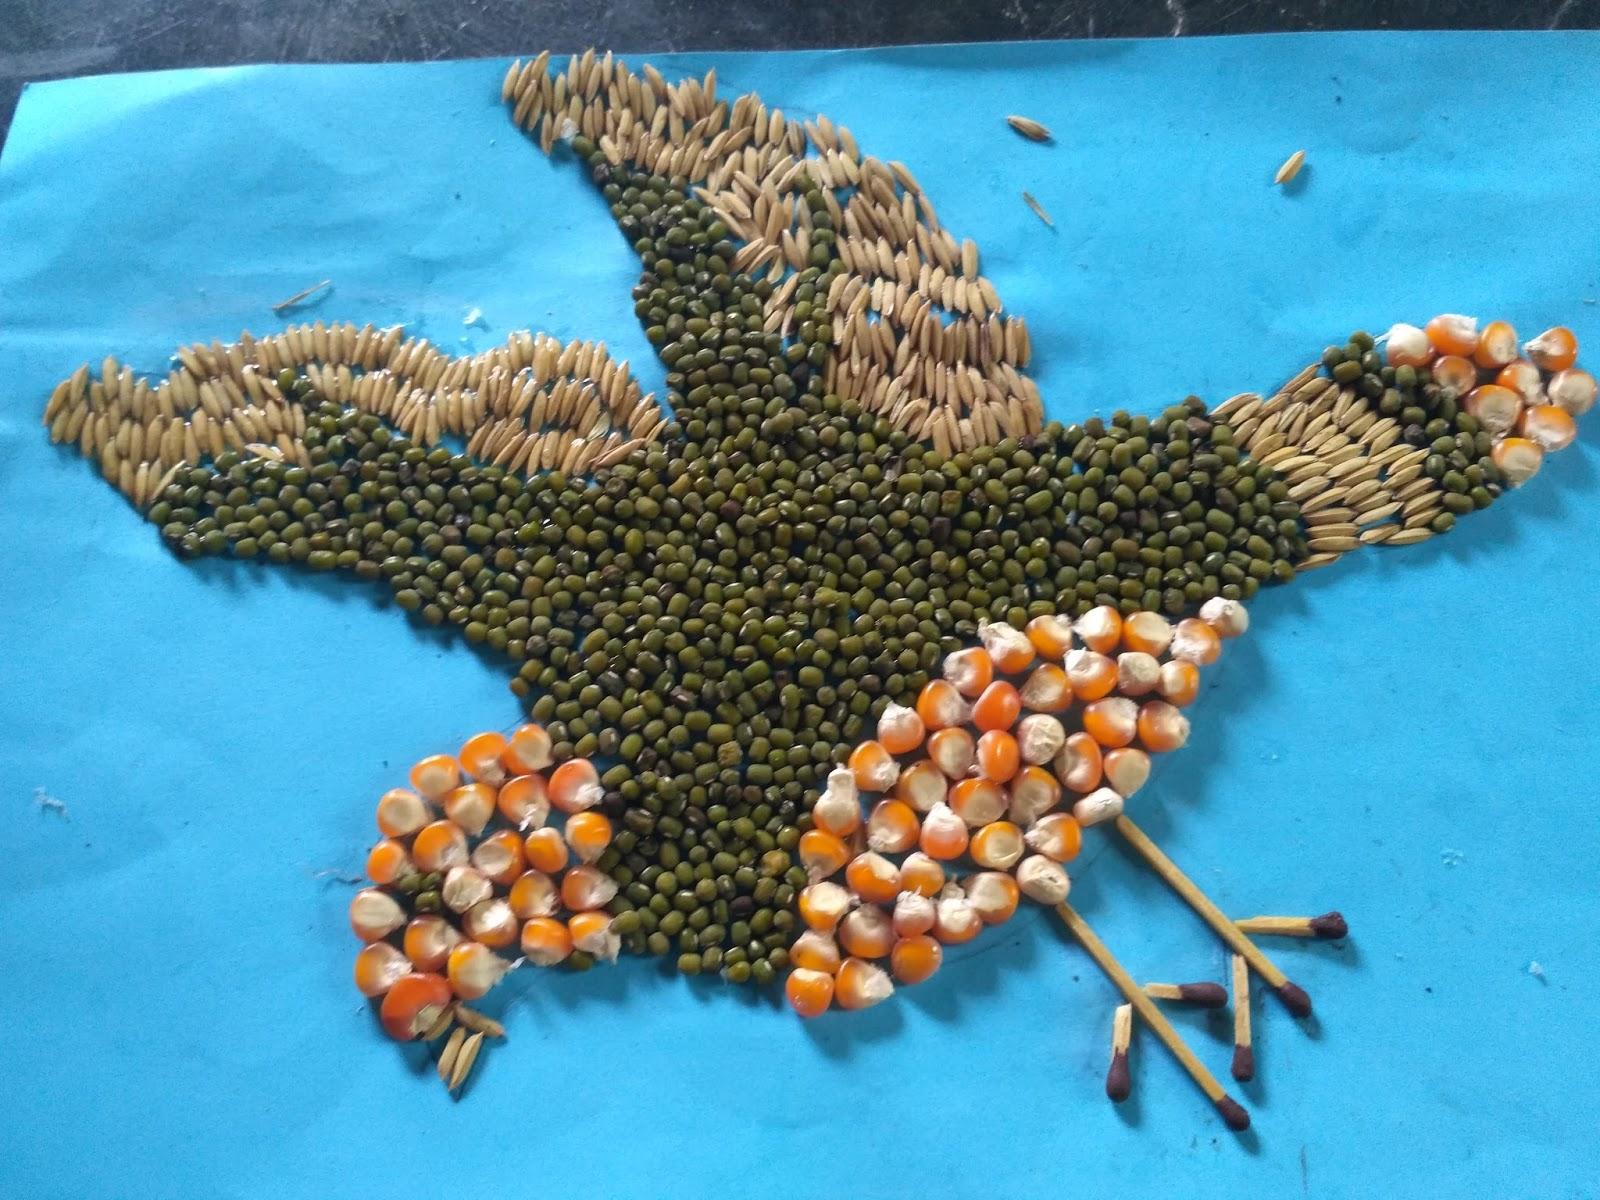 450+ Gambar Kolase Hewan Burung Dari Biji Bijian Terbaru